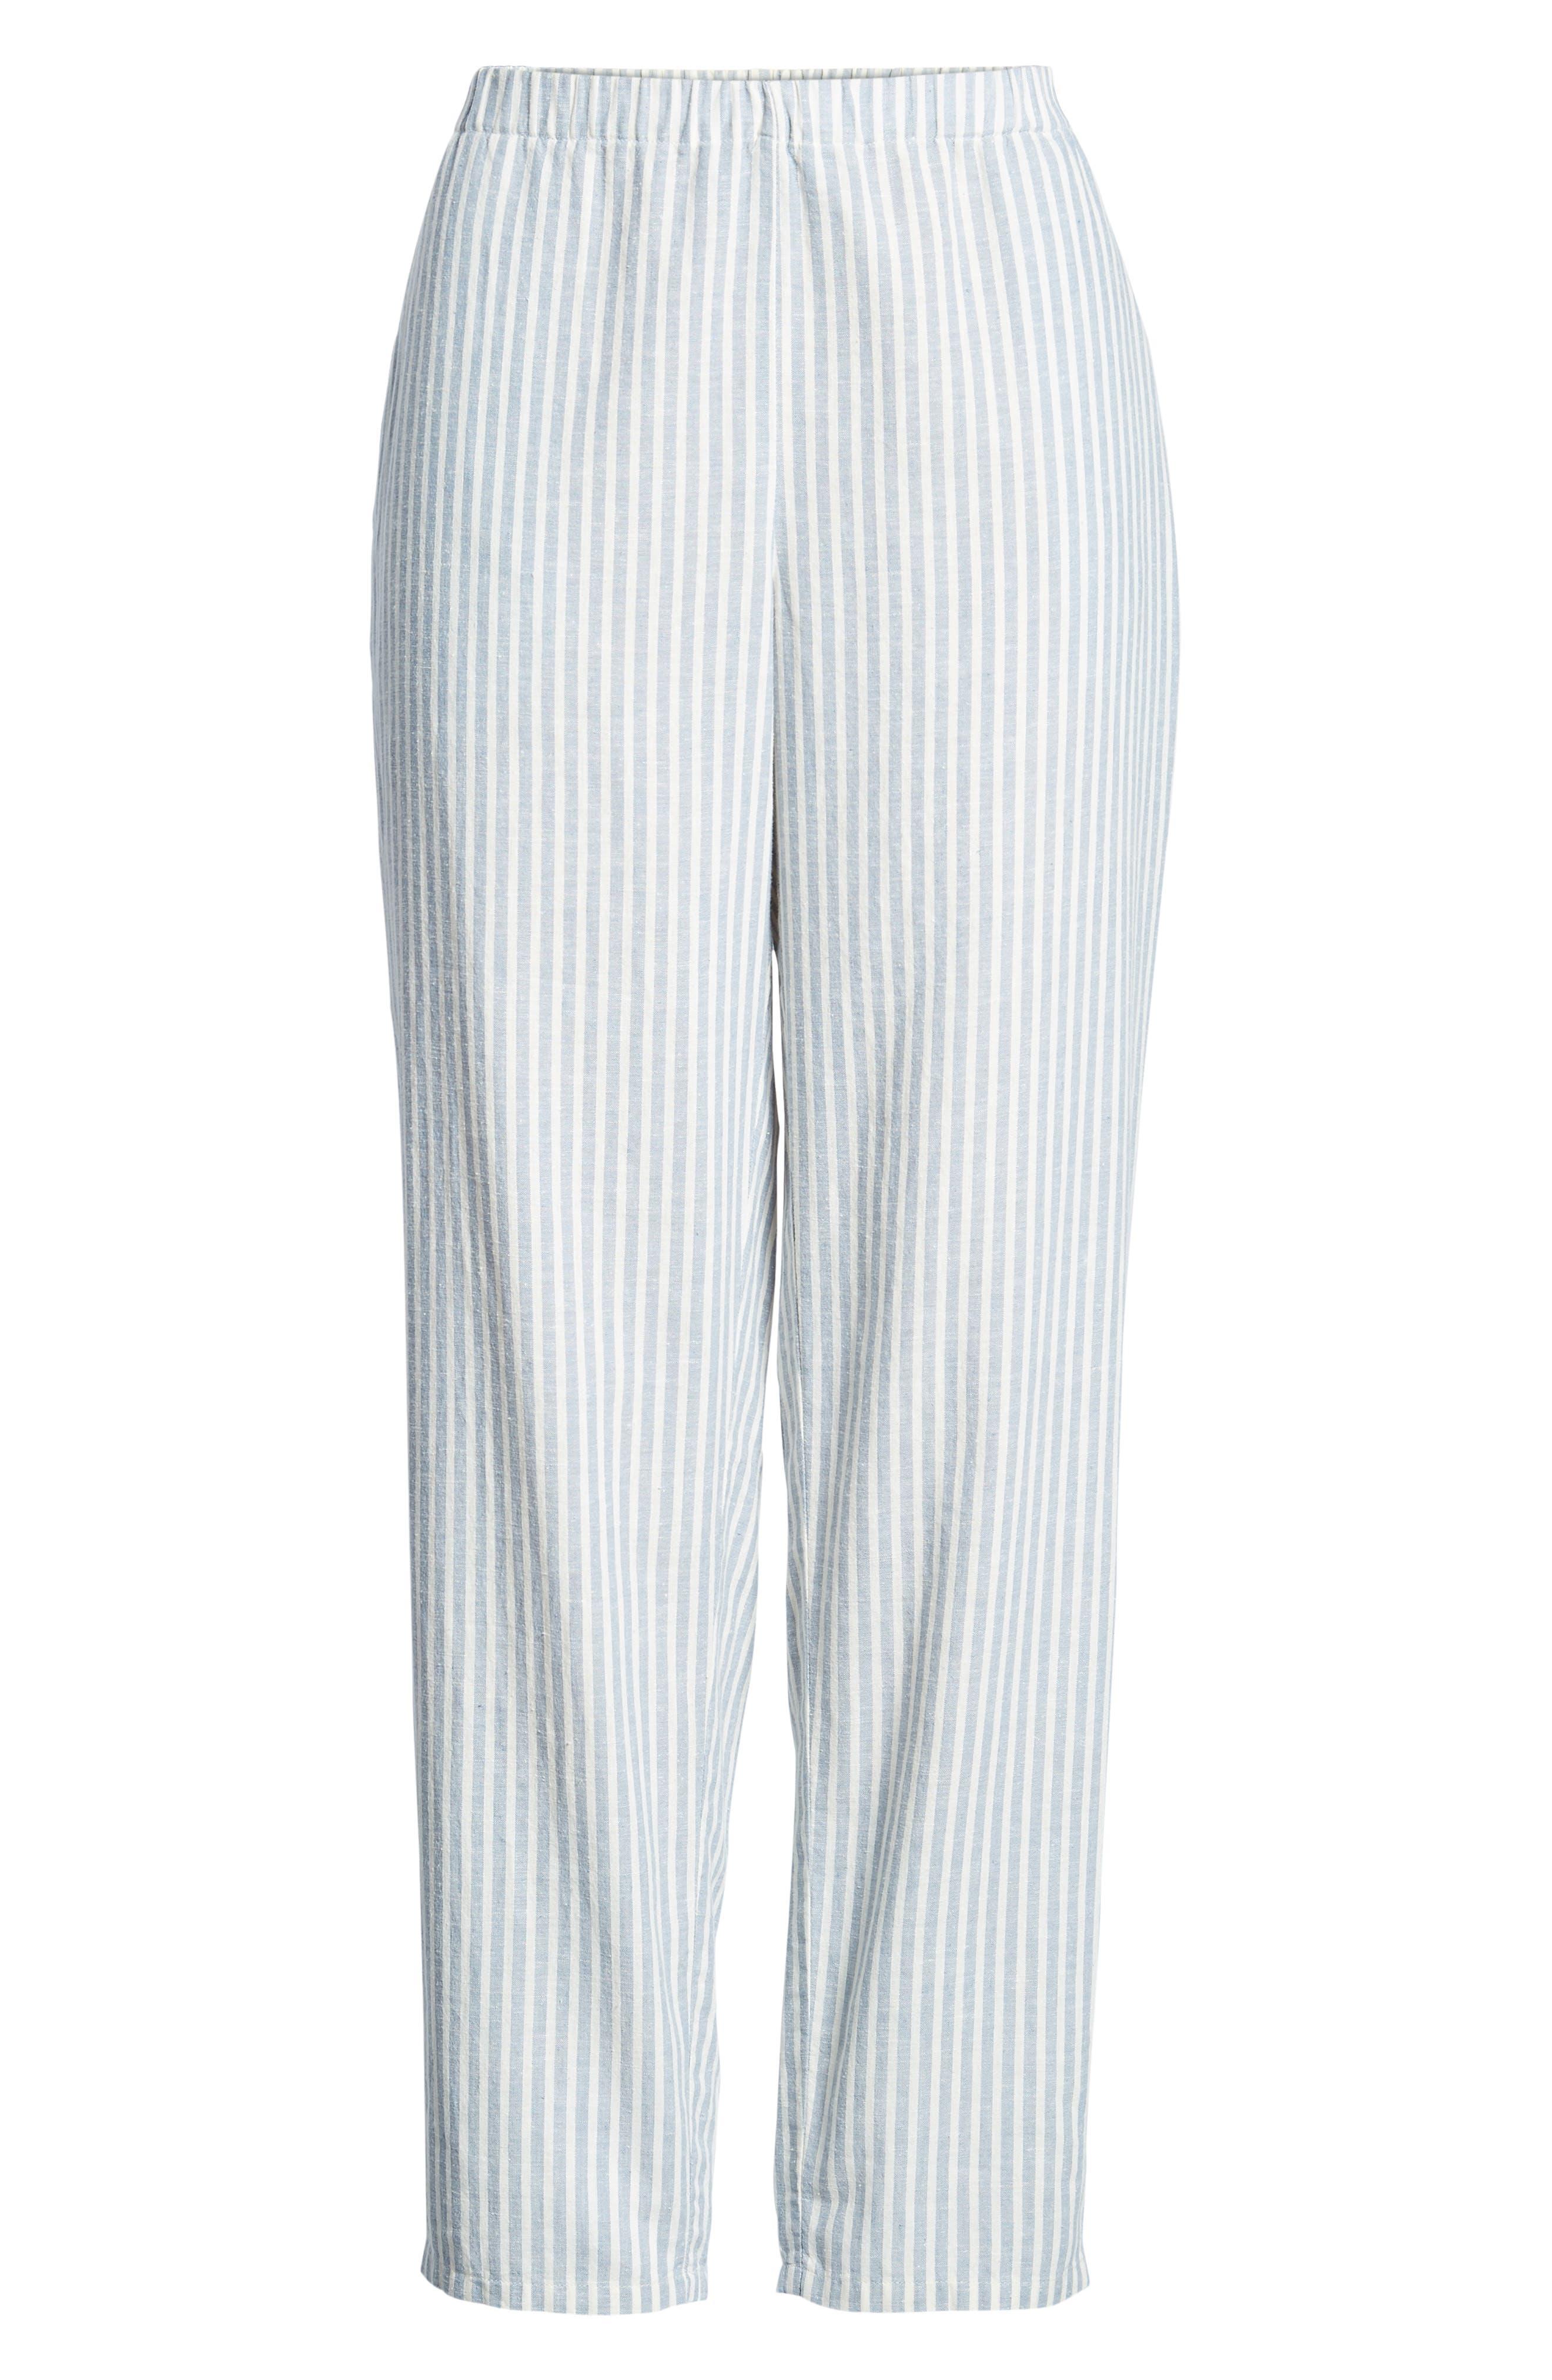 Stripe Tapered Hemp Blend Ankle Pants,                             Alternate thumbnail 7, color,                             Chambray